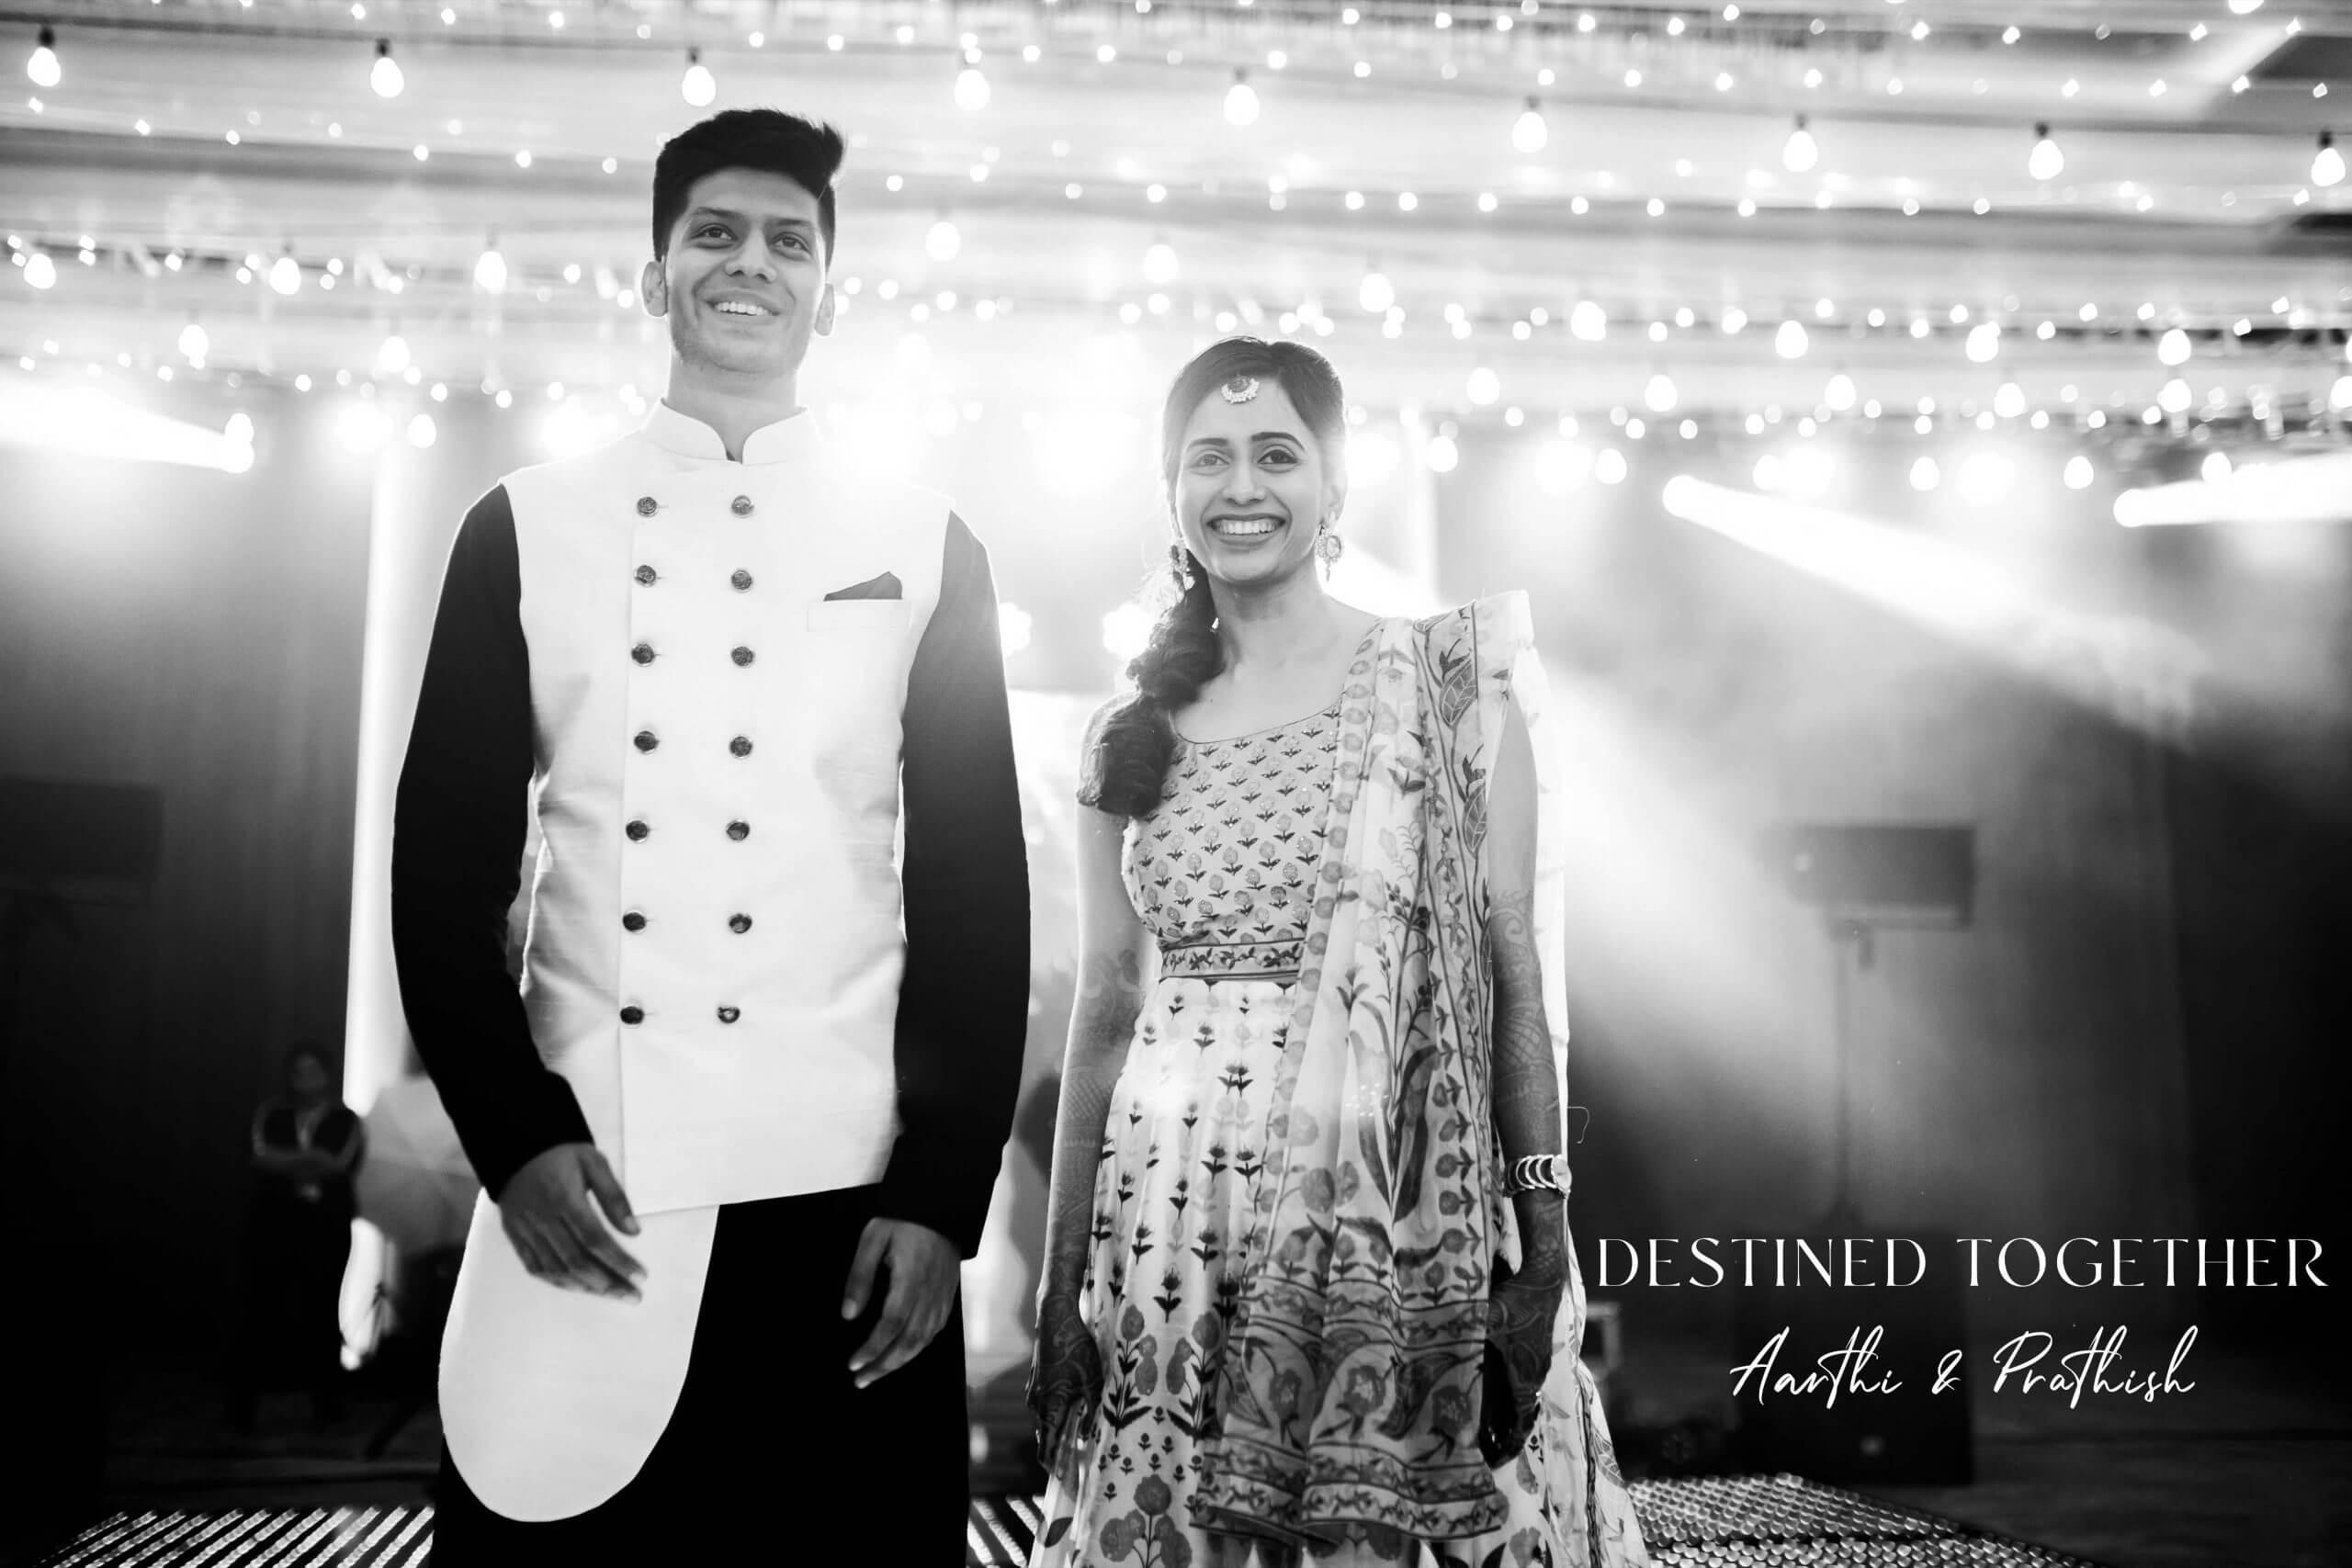 Aarthi & Prathish